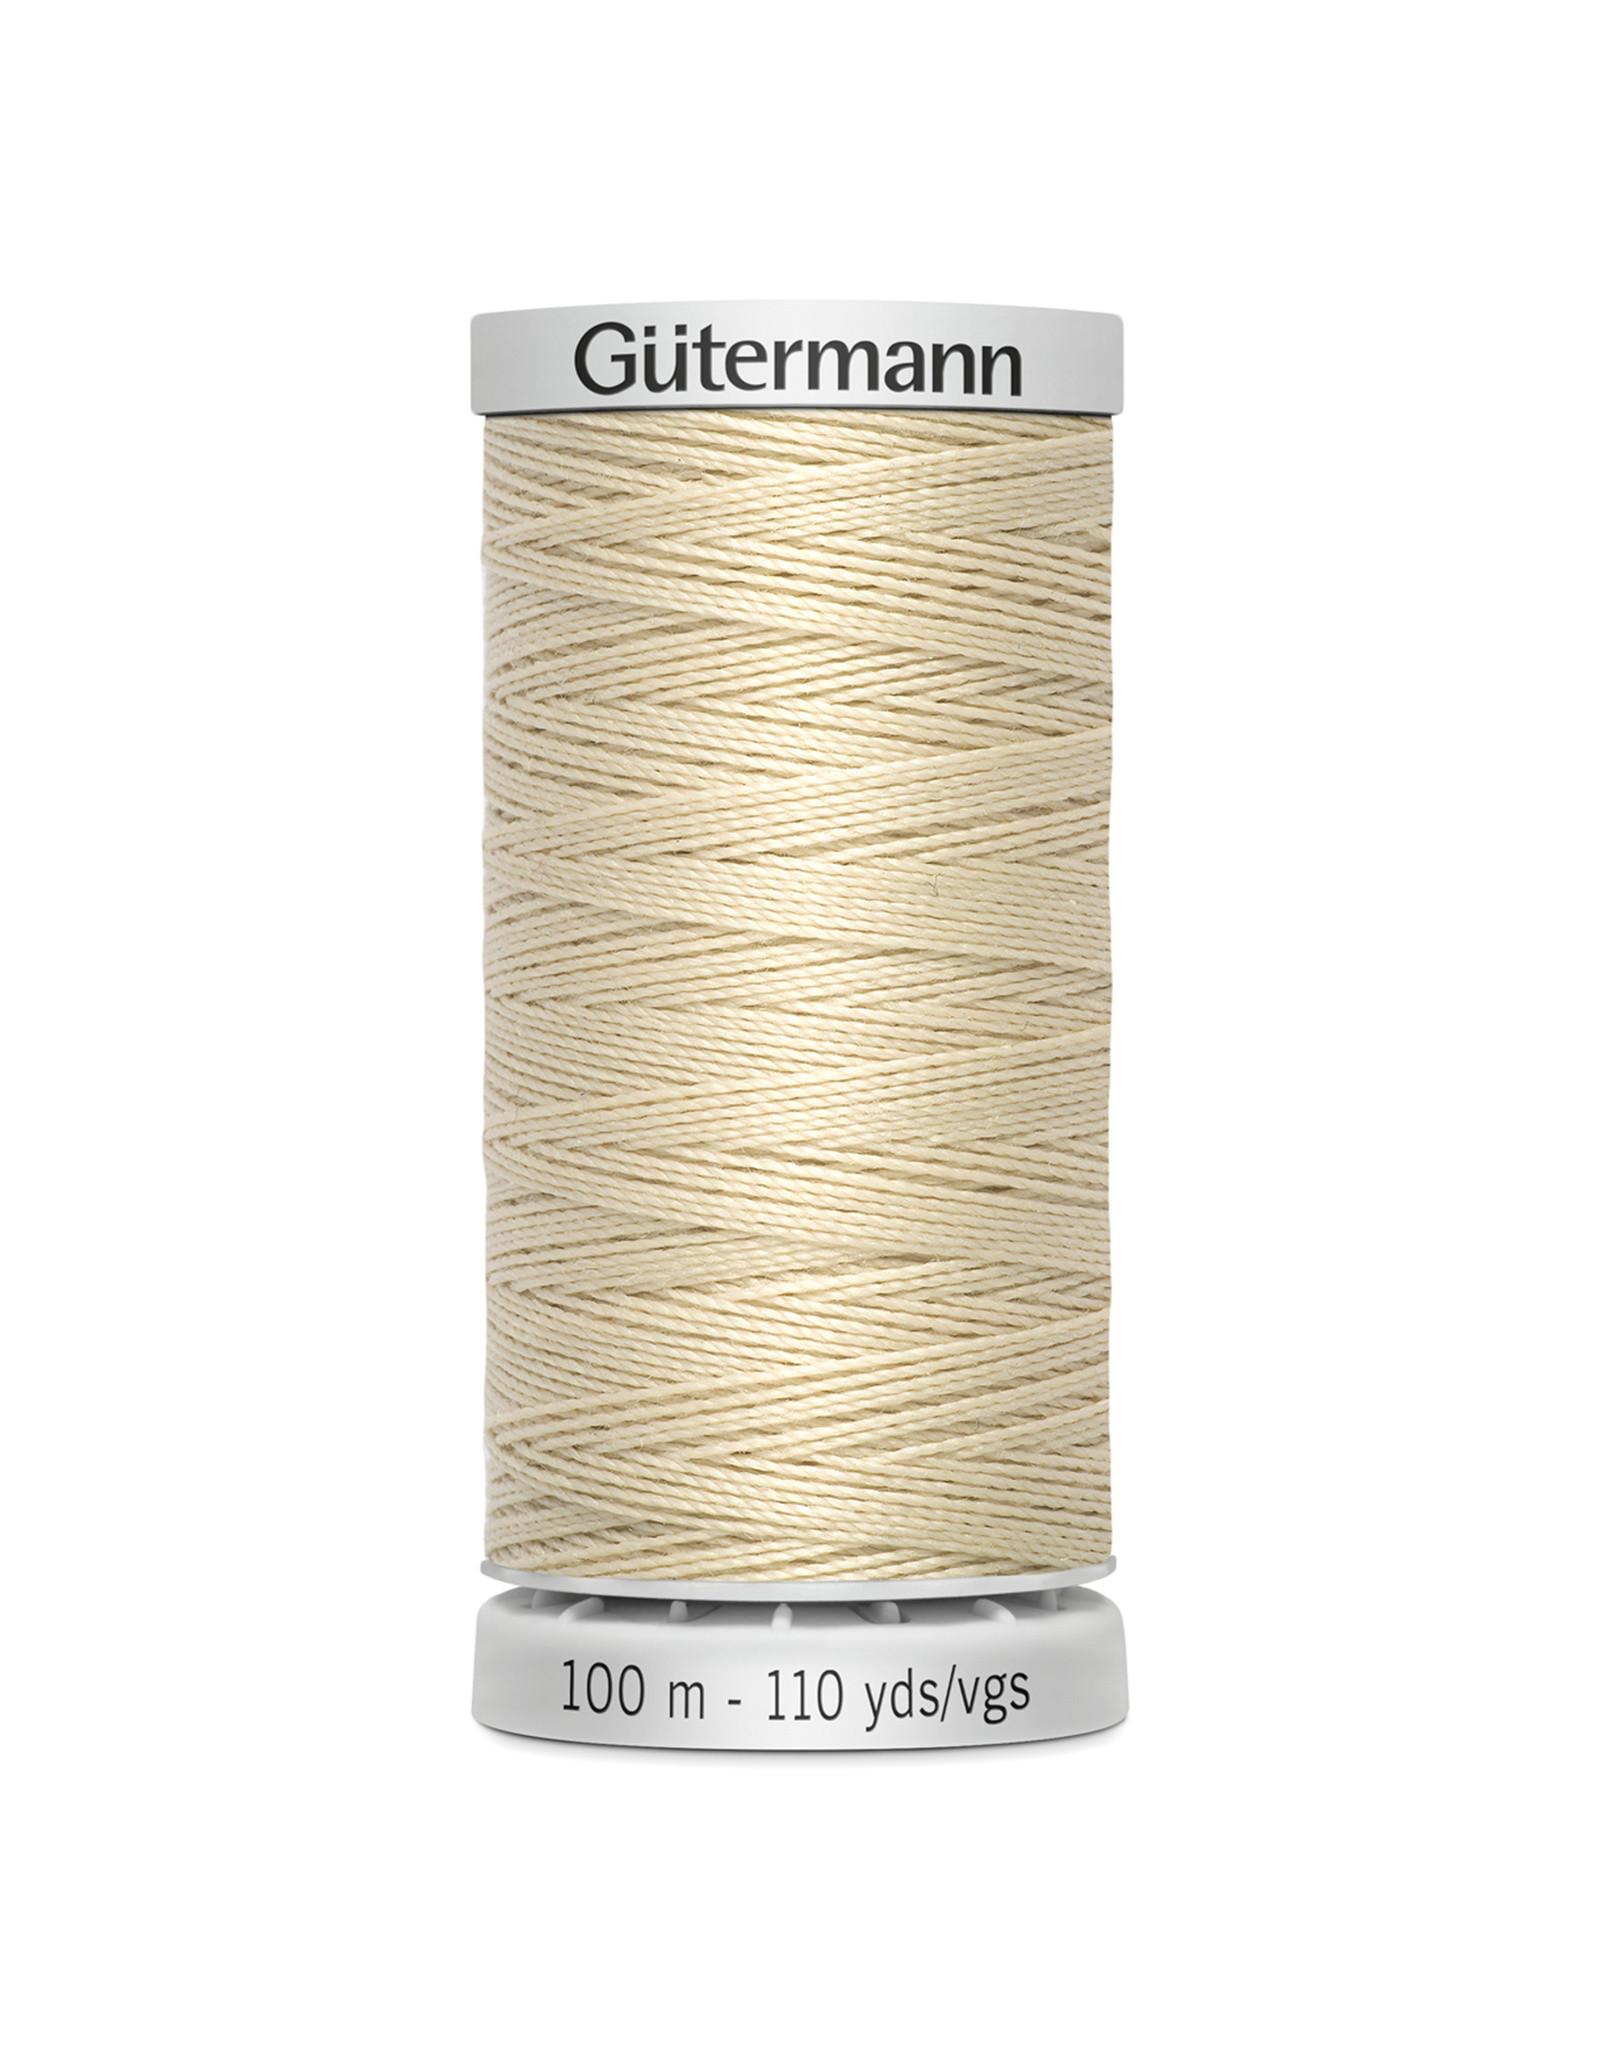 Gütermann Gütermann Super Strong thread 100 m - 414